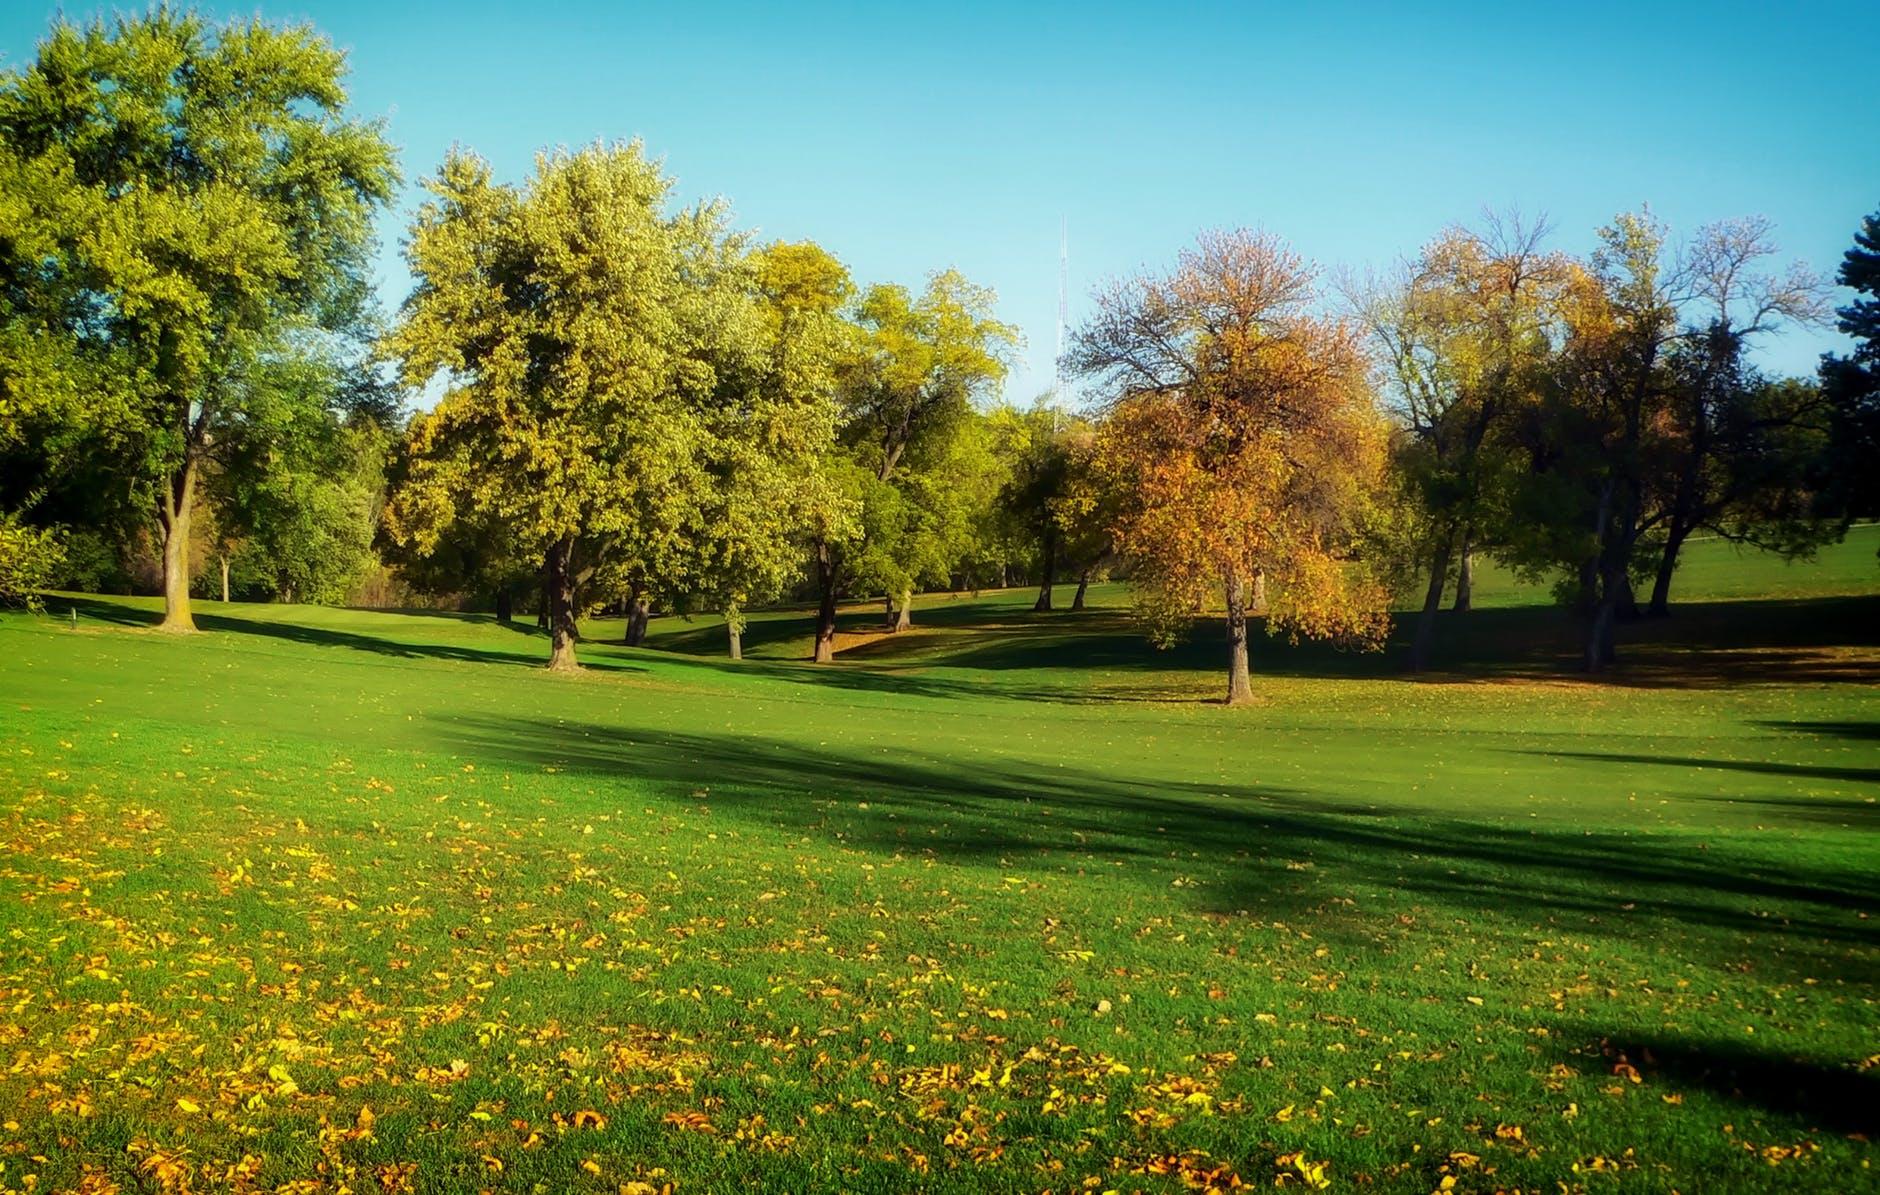 trees grass lawn park